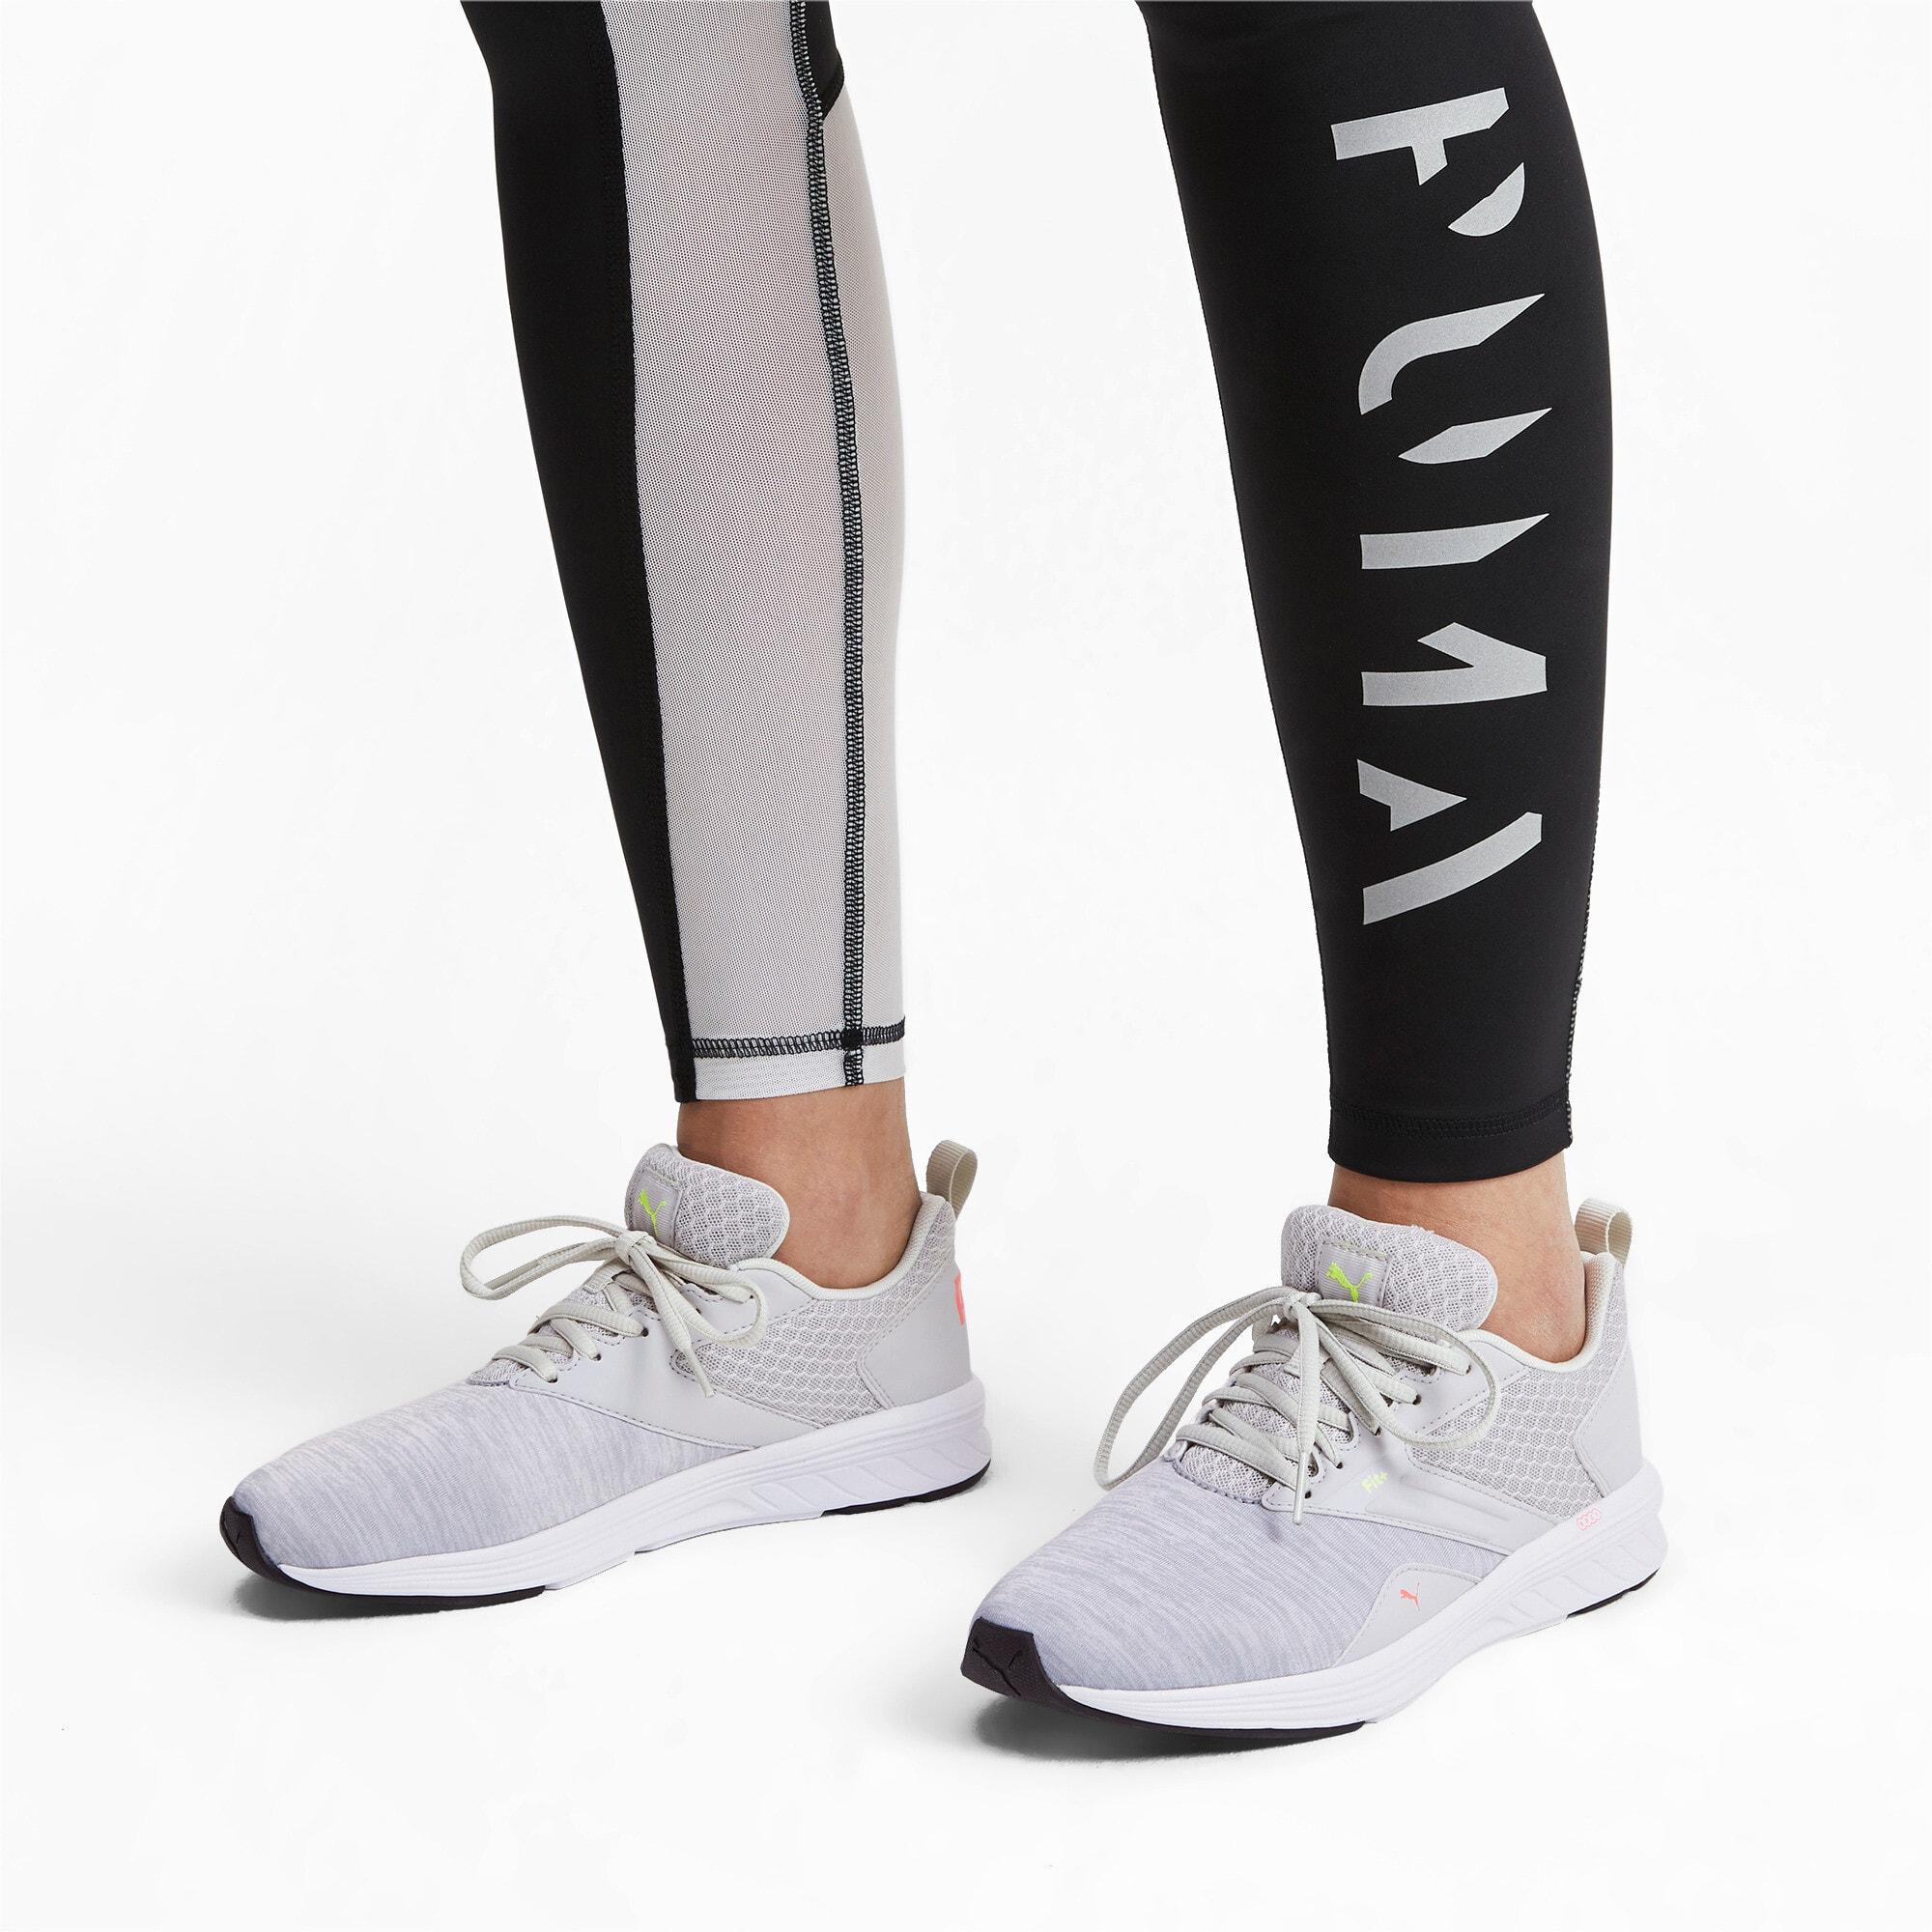 Thumbnail 3 of NRGY Comet Running Shoes, Glacier Gray, medium